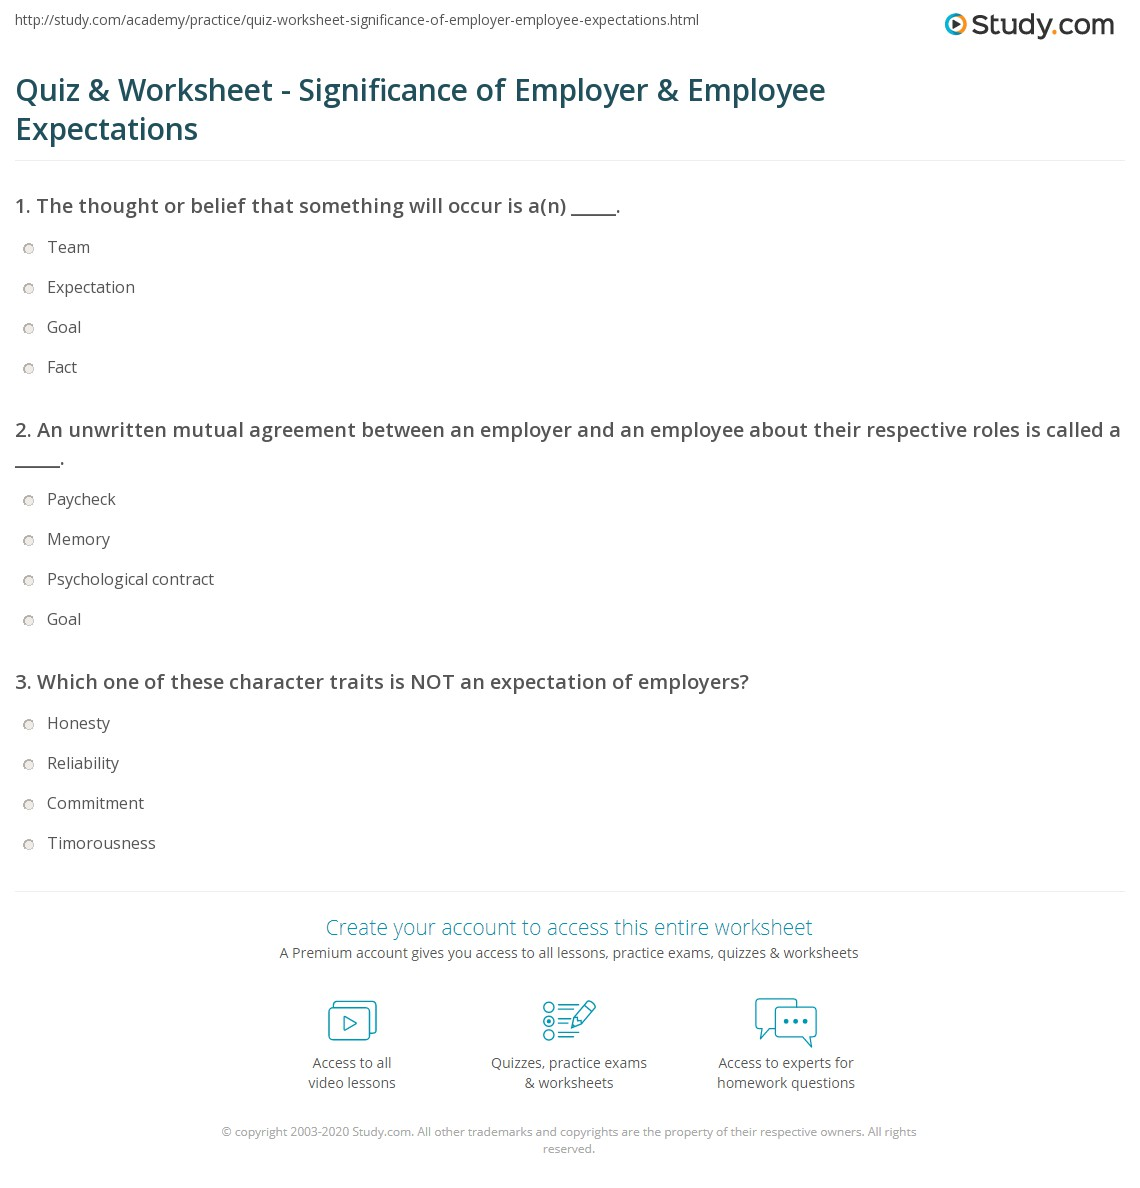 quiz worksheet significance of employer employee print the importance of employer employee expectations worksheet